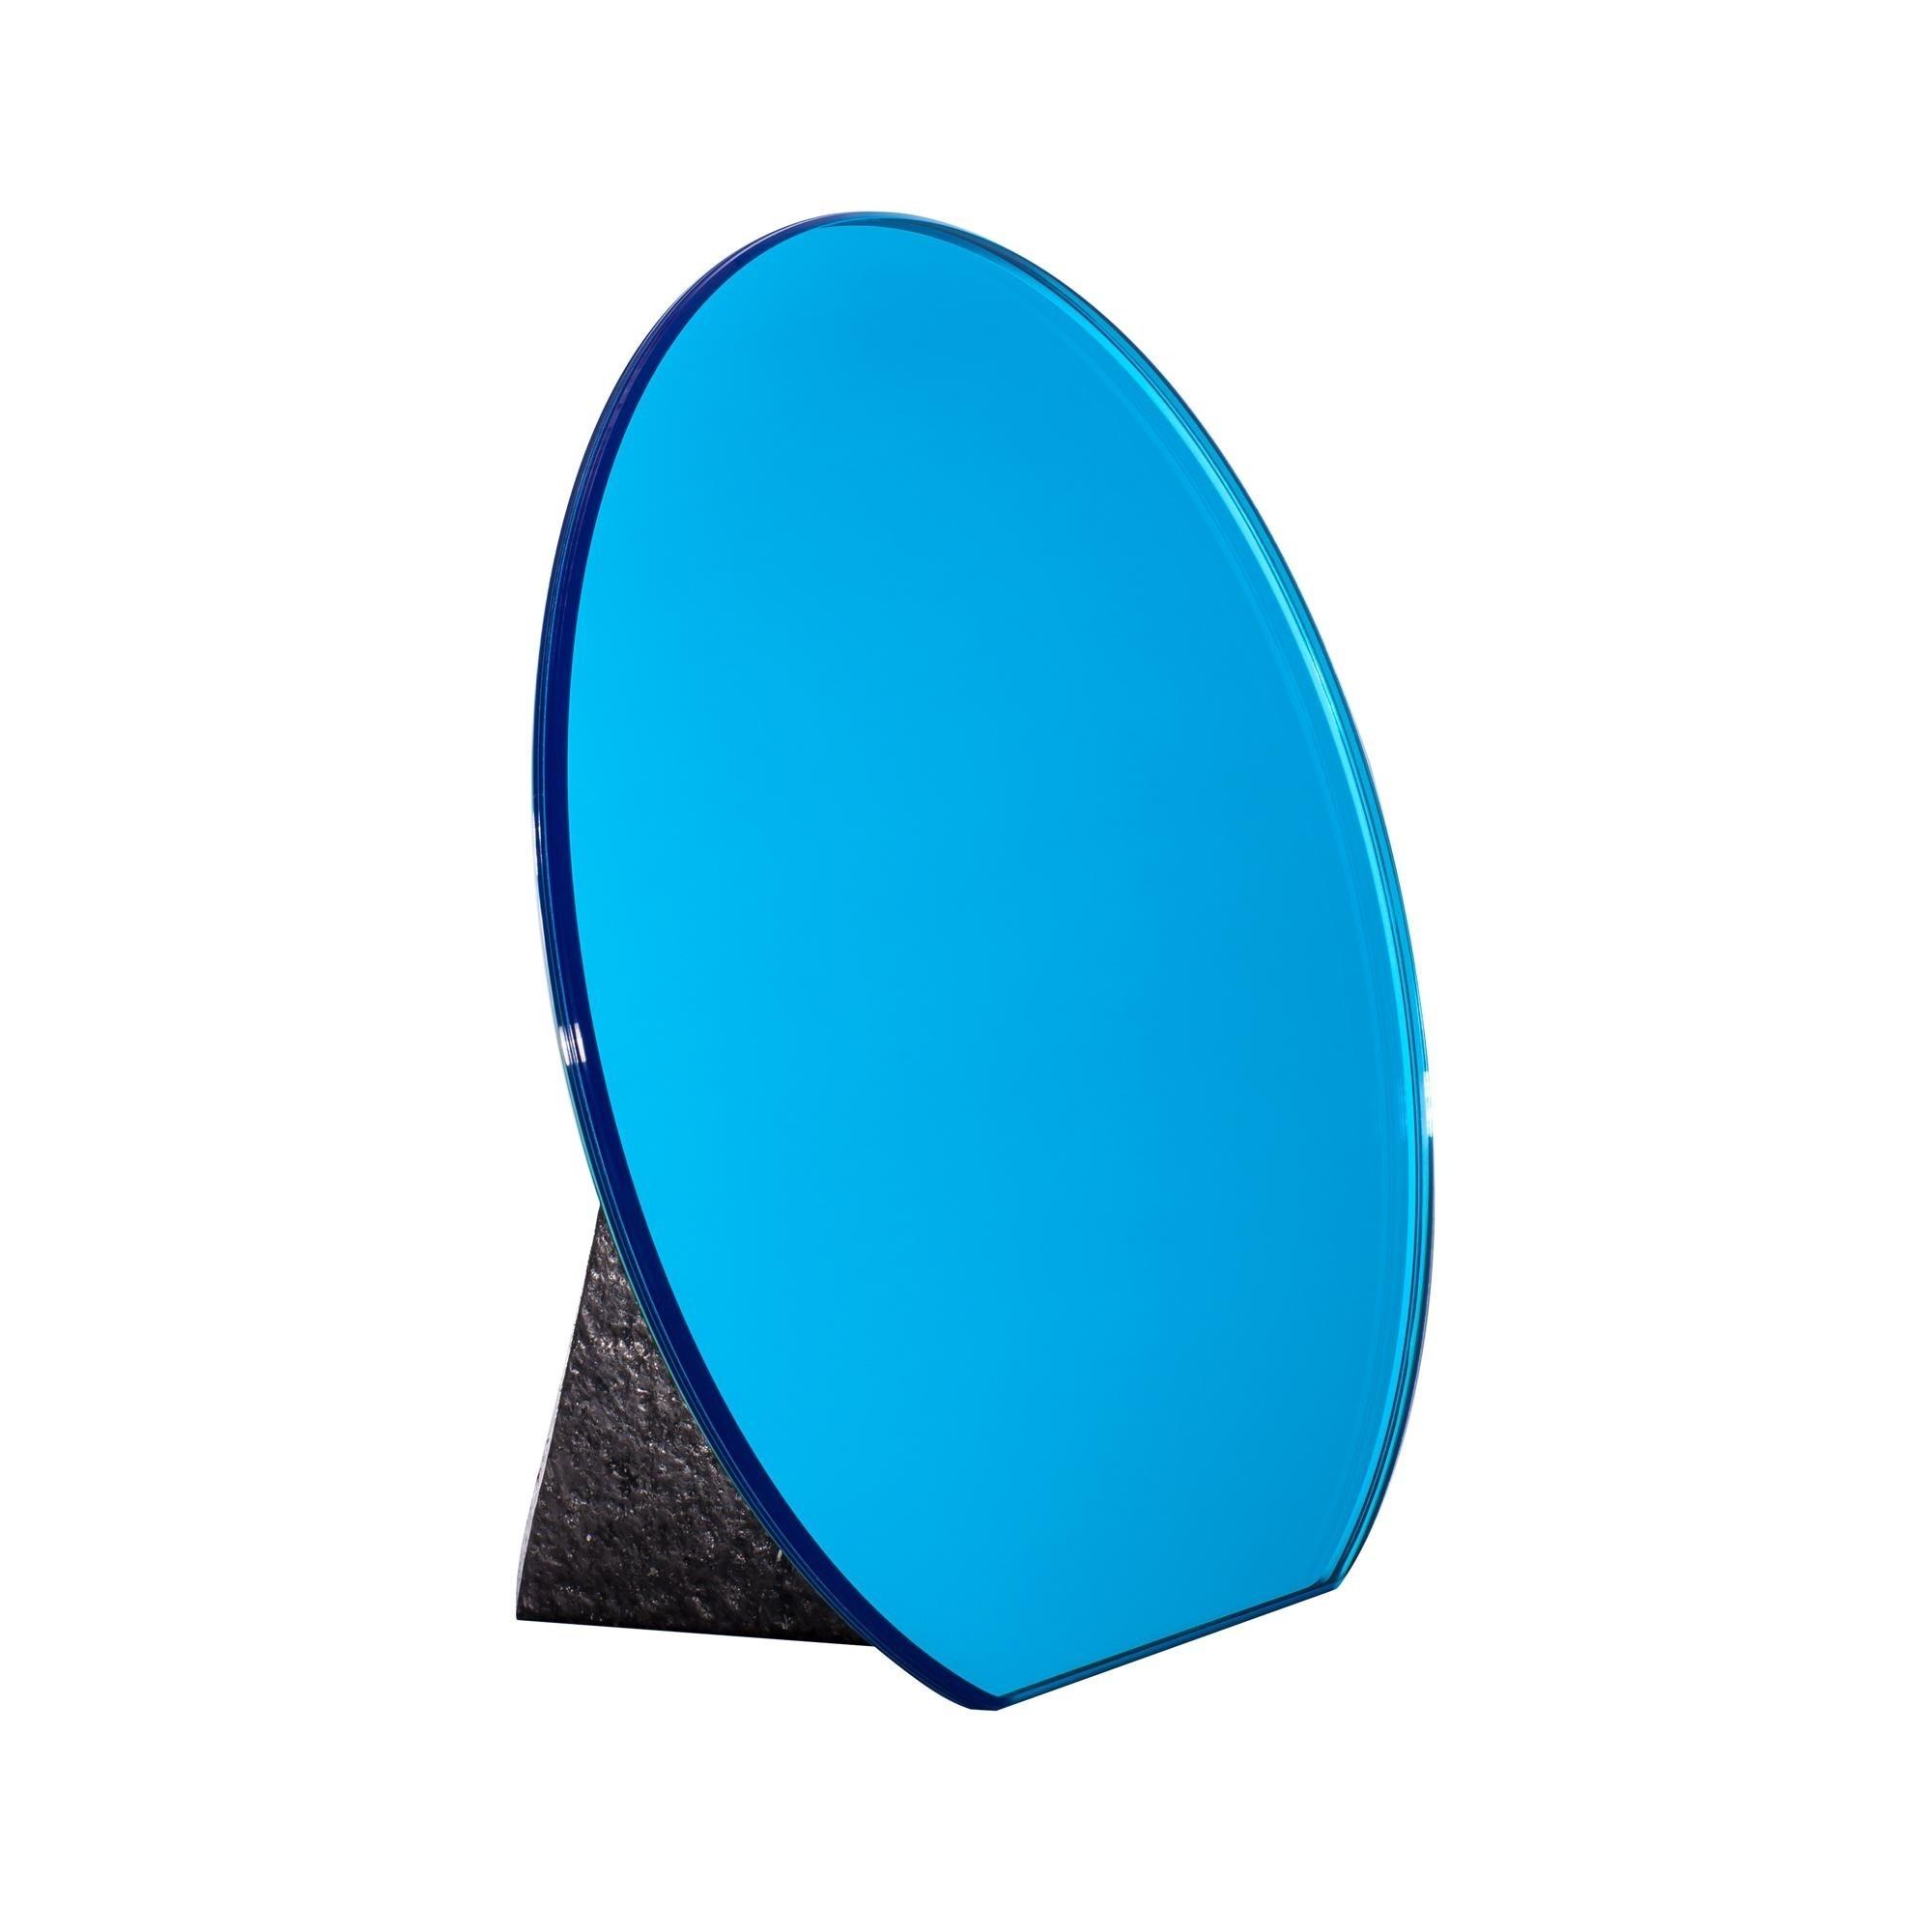 Pulpo Dita Table Mirror Ø30cm Cobalt Blue Pedestal Black